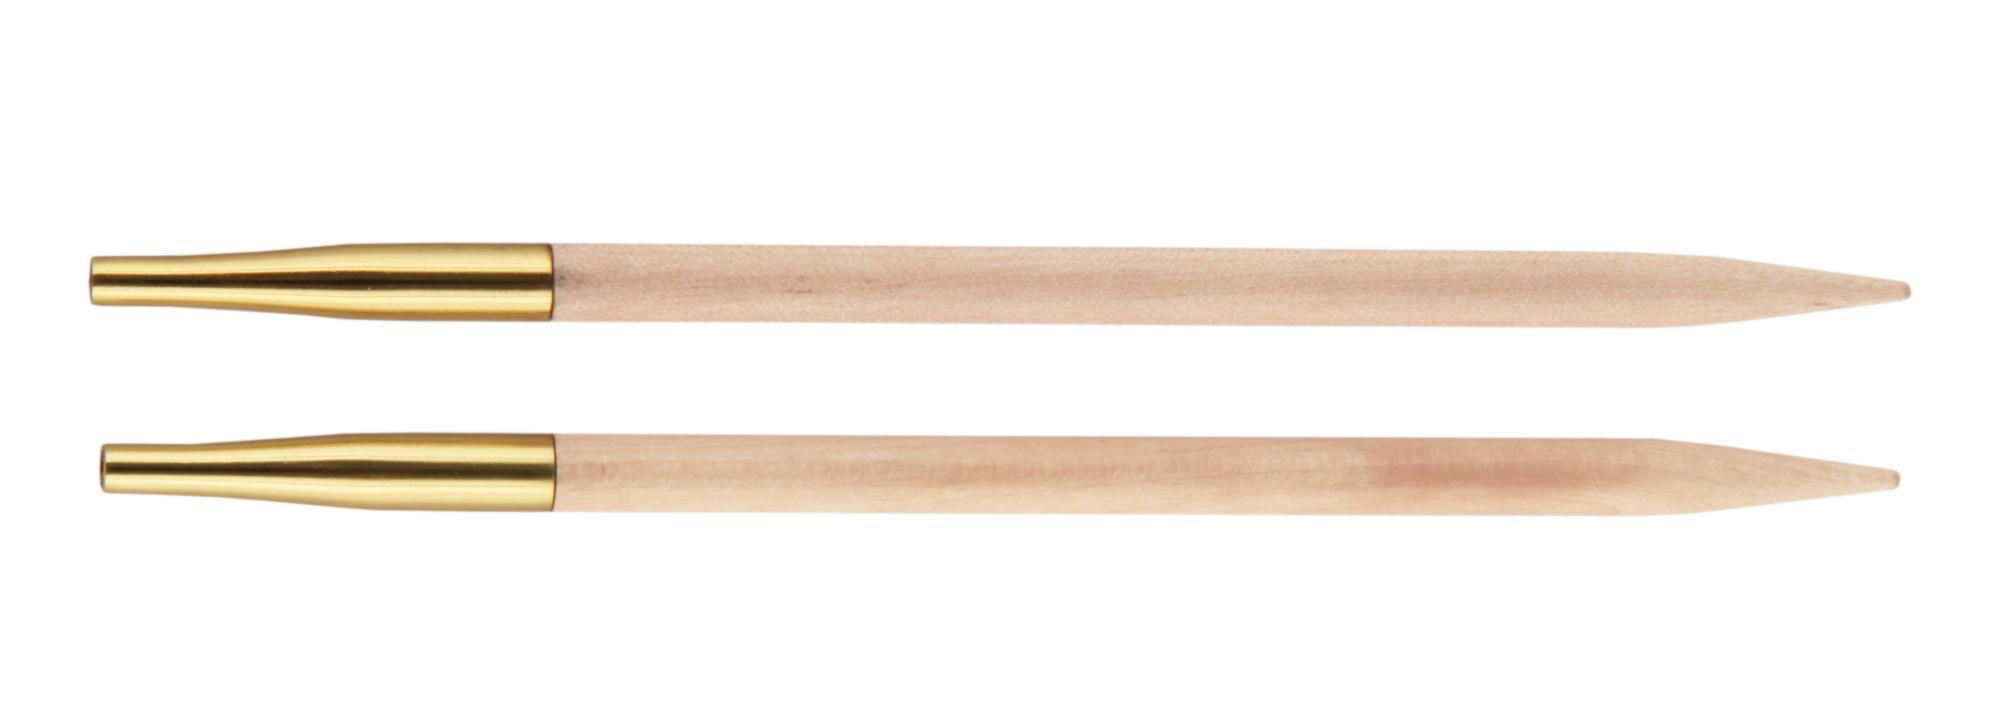 Спицы съемные короткие Basix Birch Wood KnitPro, 35658, 5.50 мм